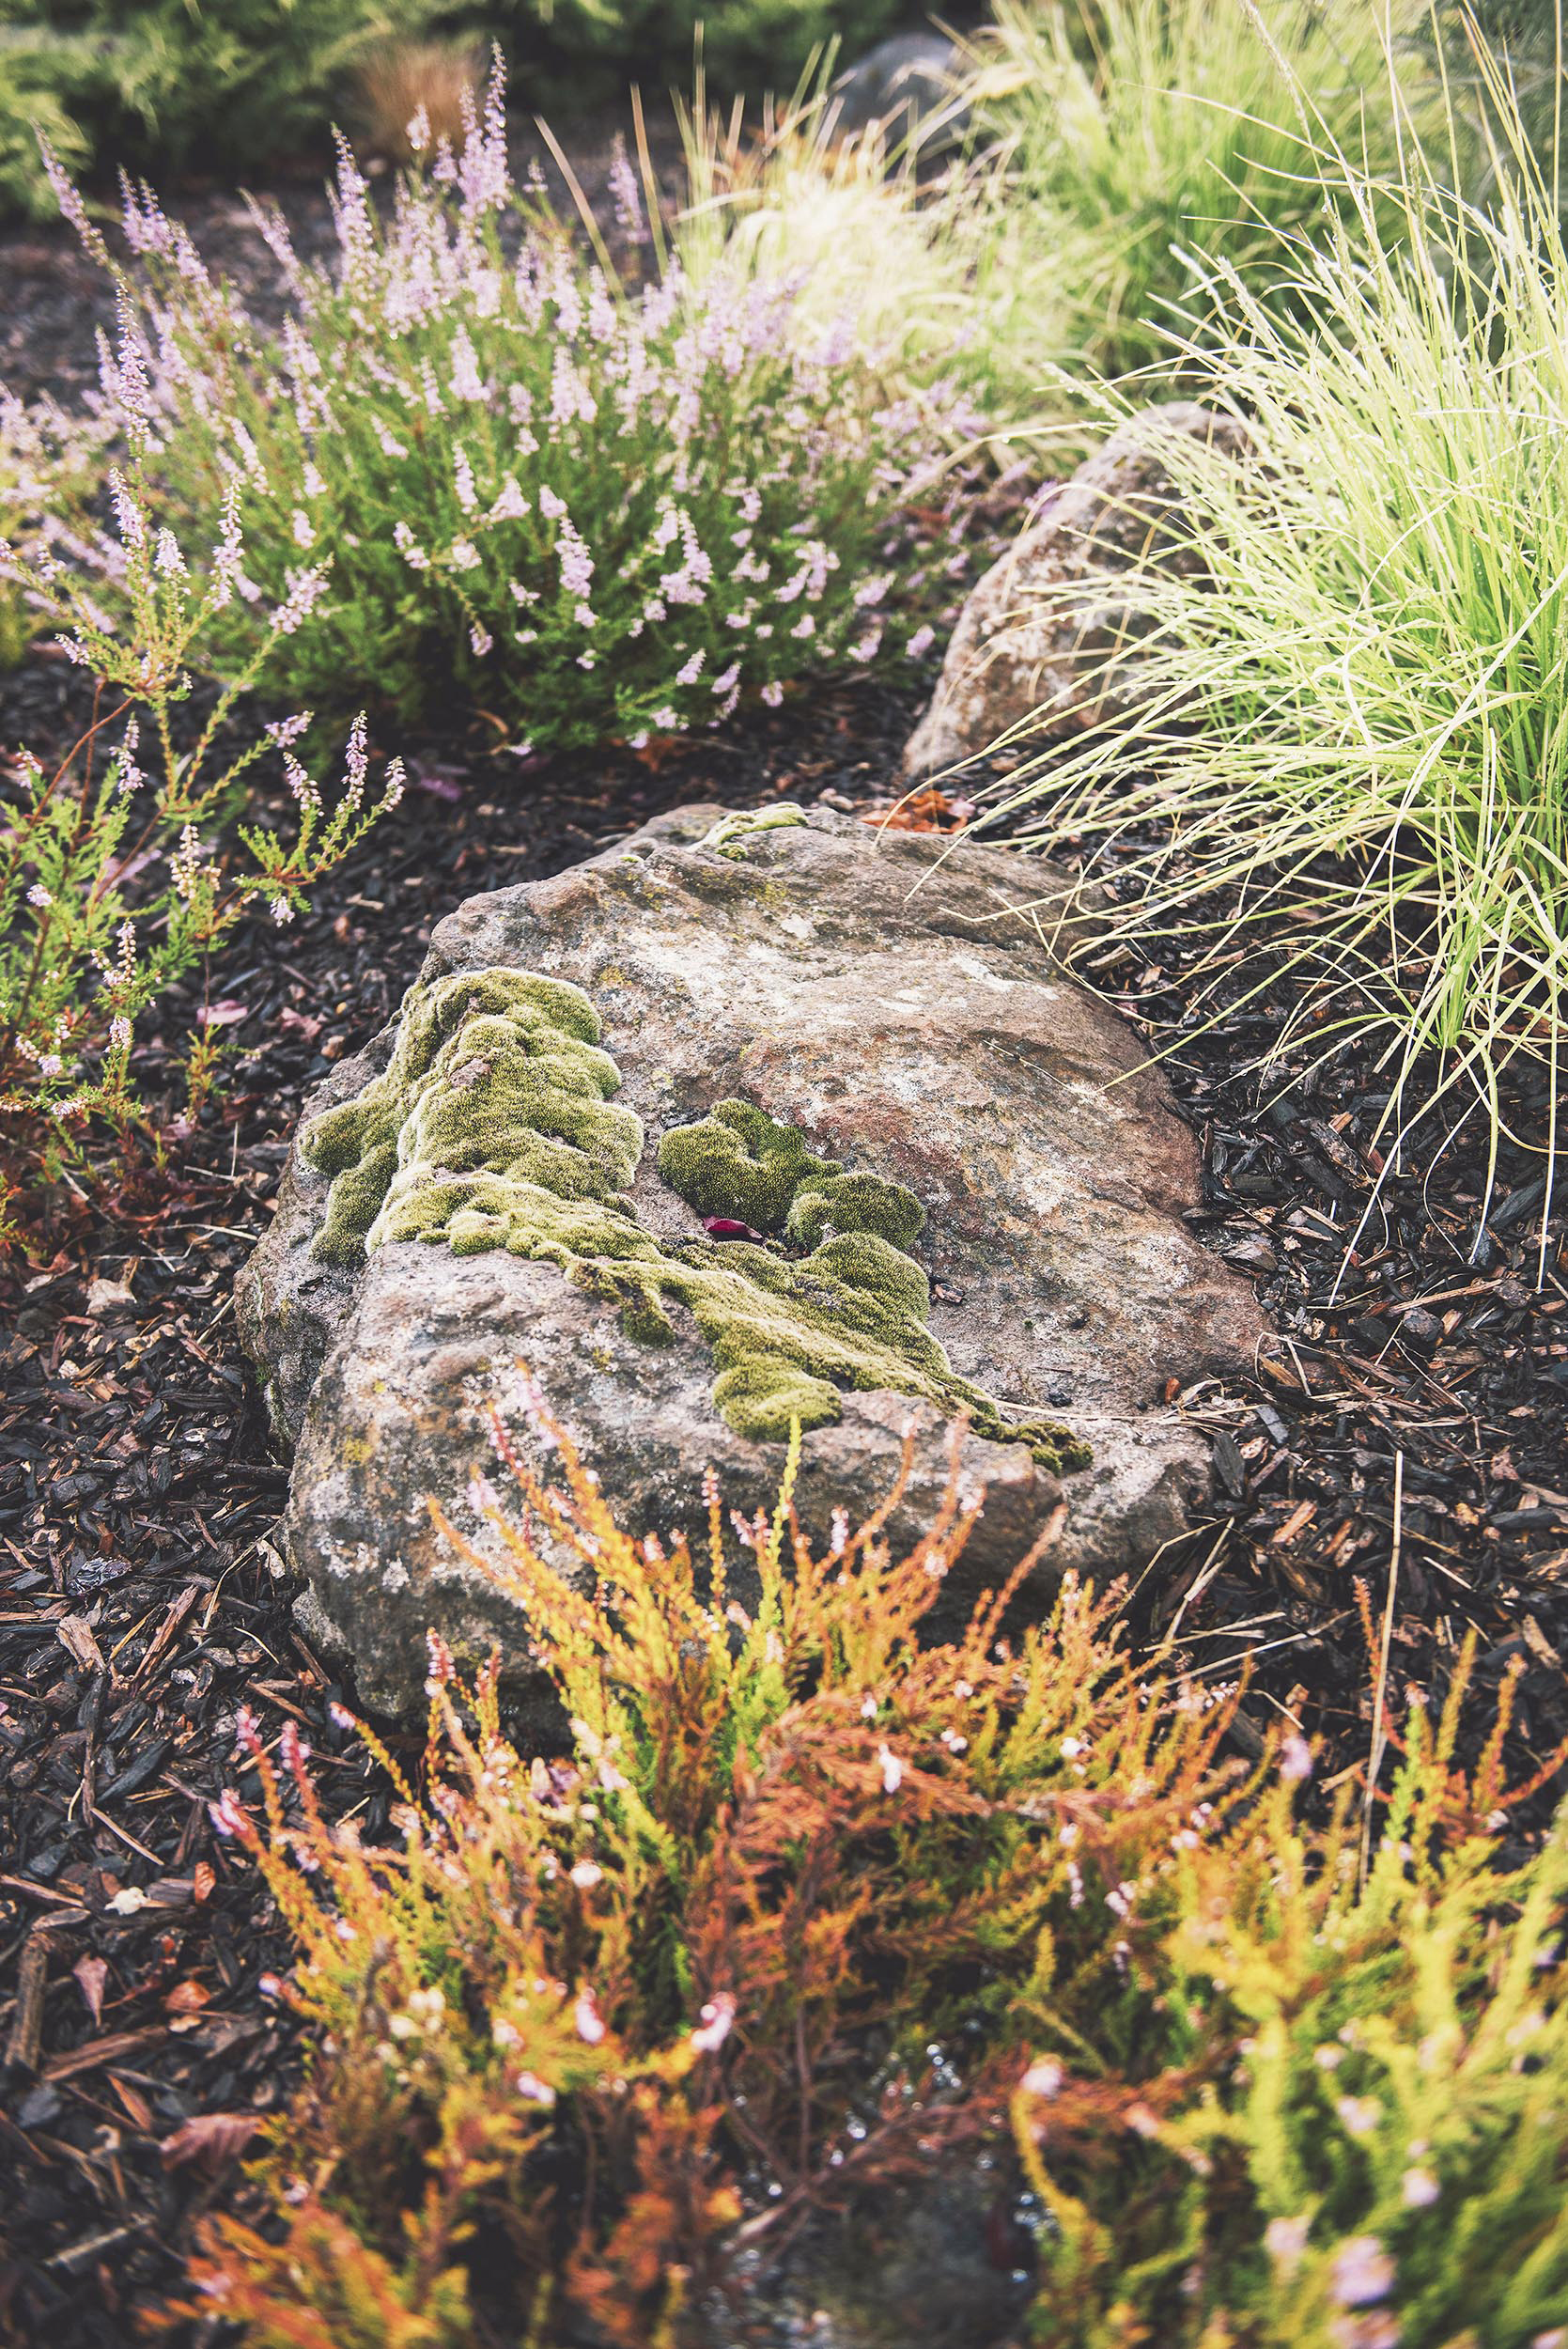 granite boulder + moss + calluna + bunch grasses + perennial PNW landscaping